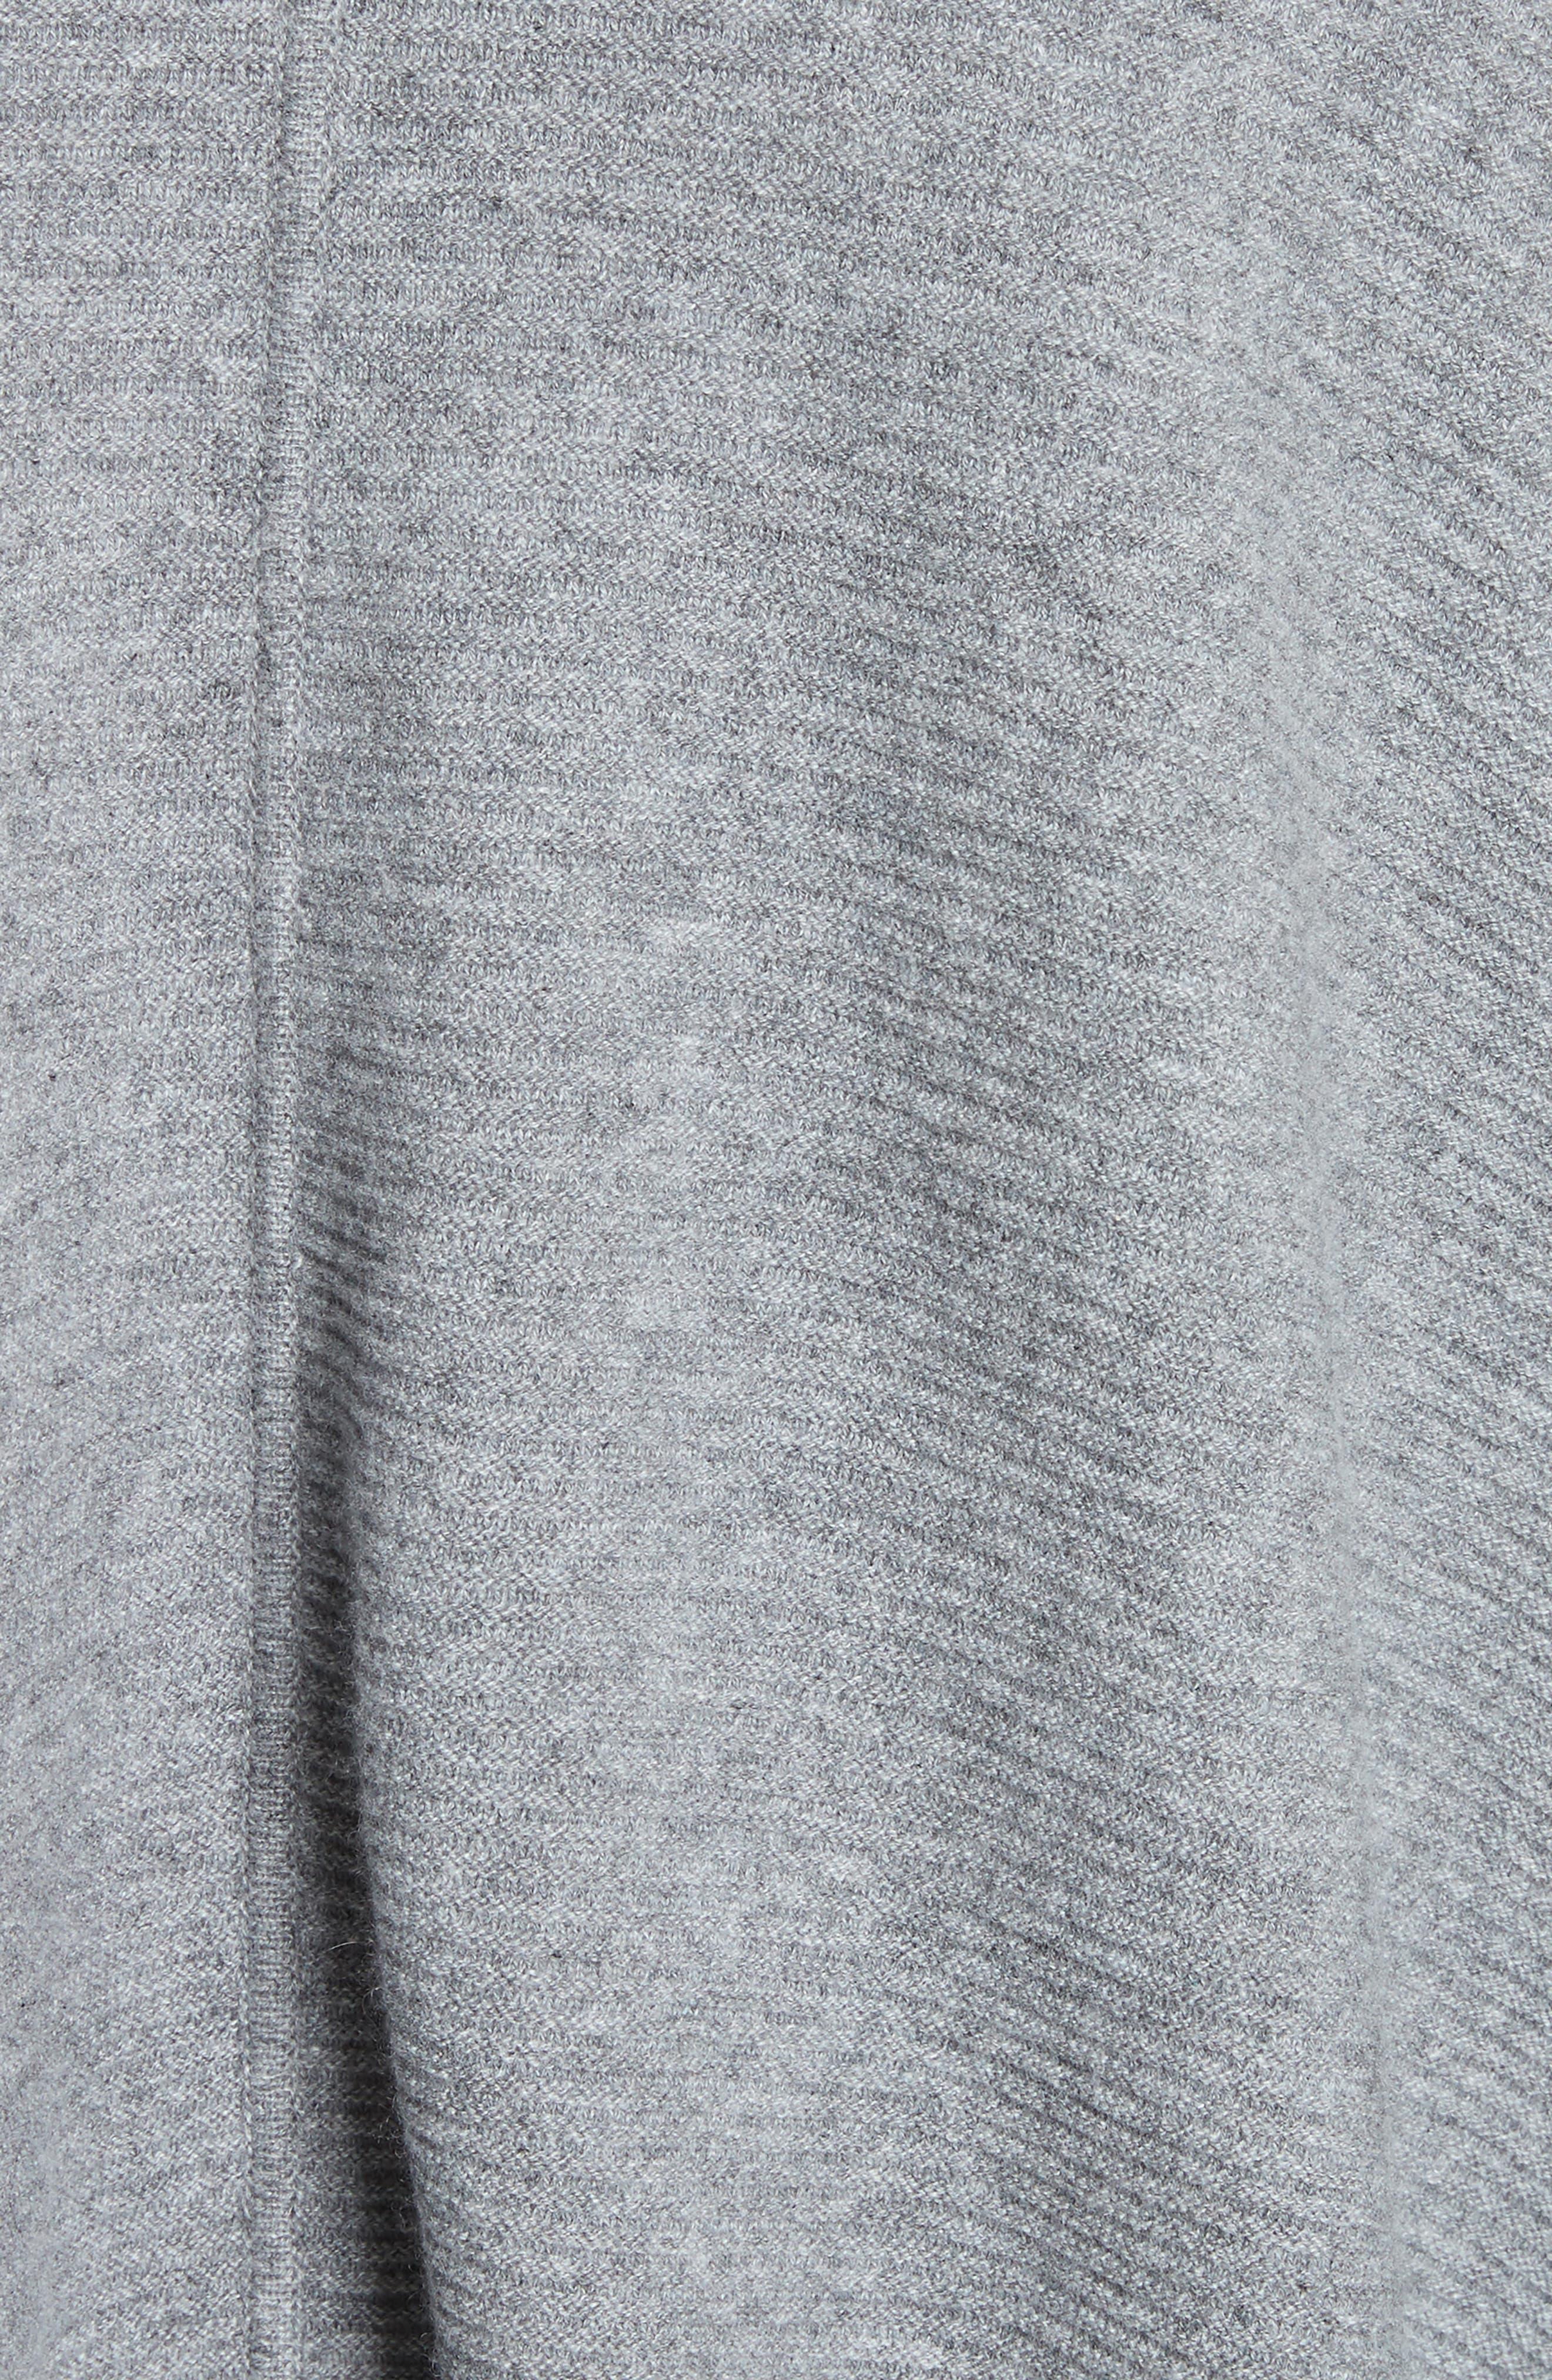 Cashmere Wrap,                             Alternate thumbnail 5, color,                             NICKEL MELANGE